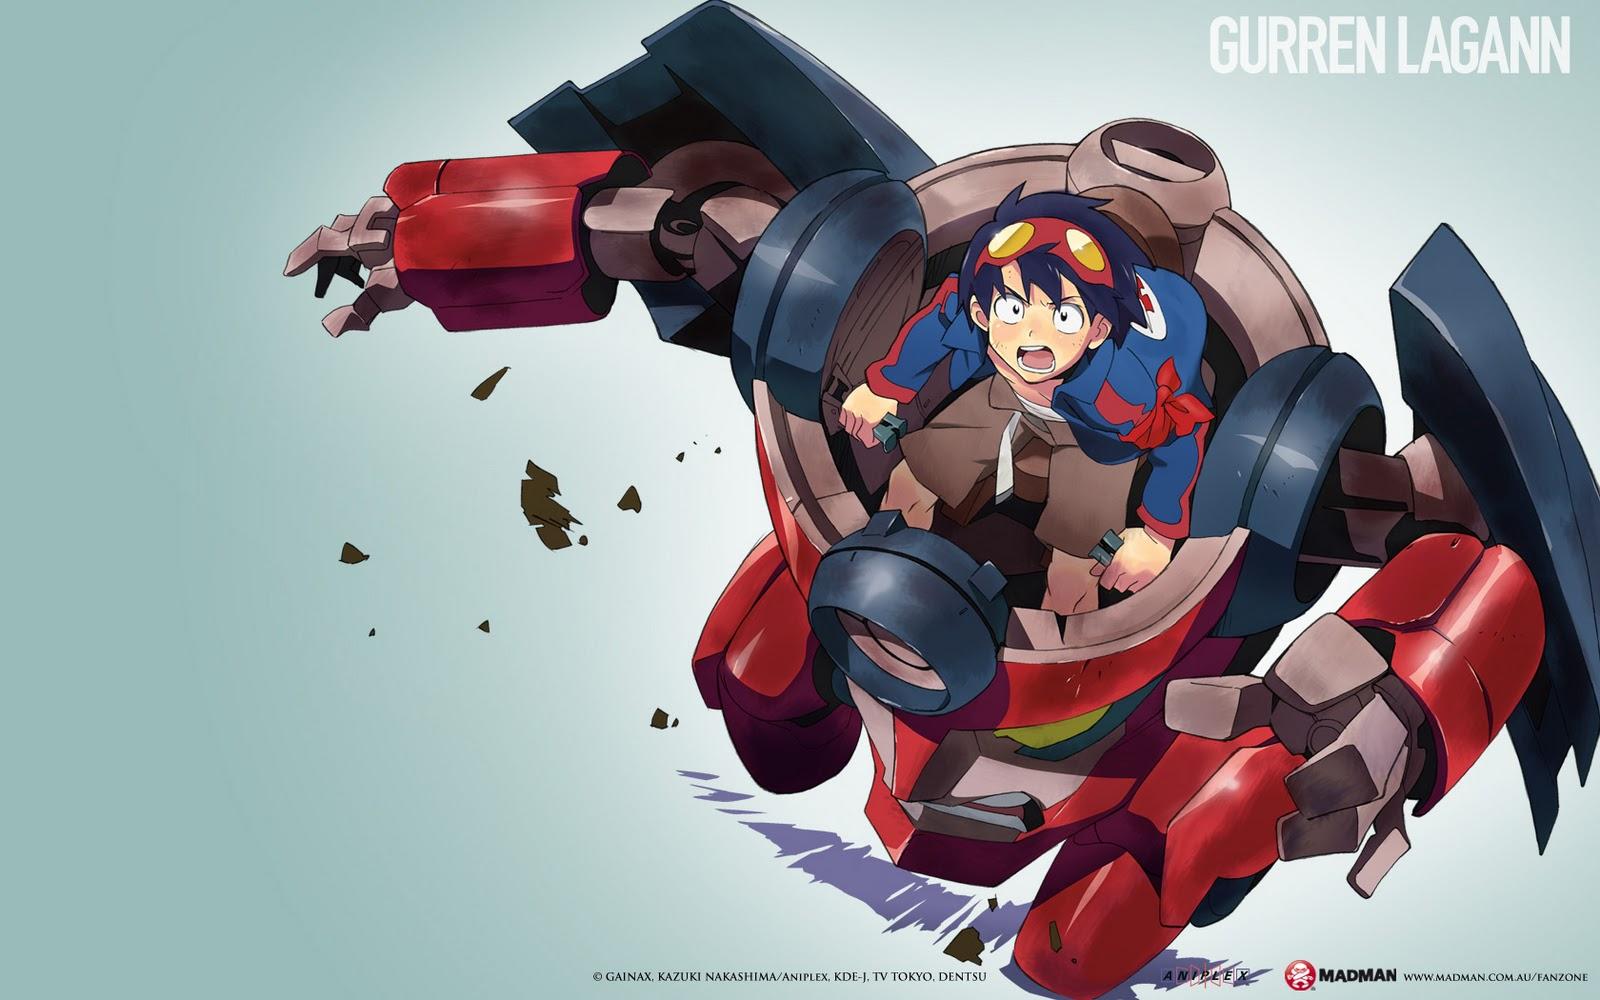 Ani-verse: The Anime Portal: Gurren Lagann